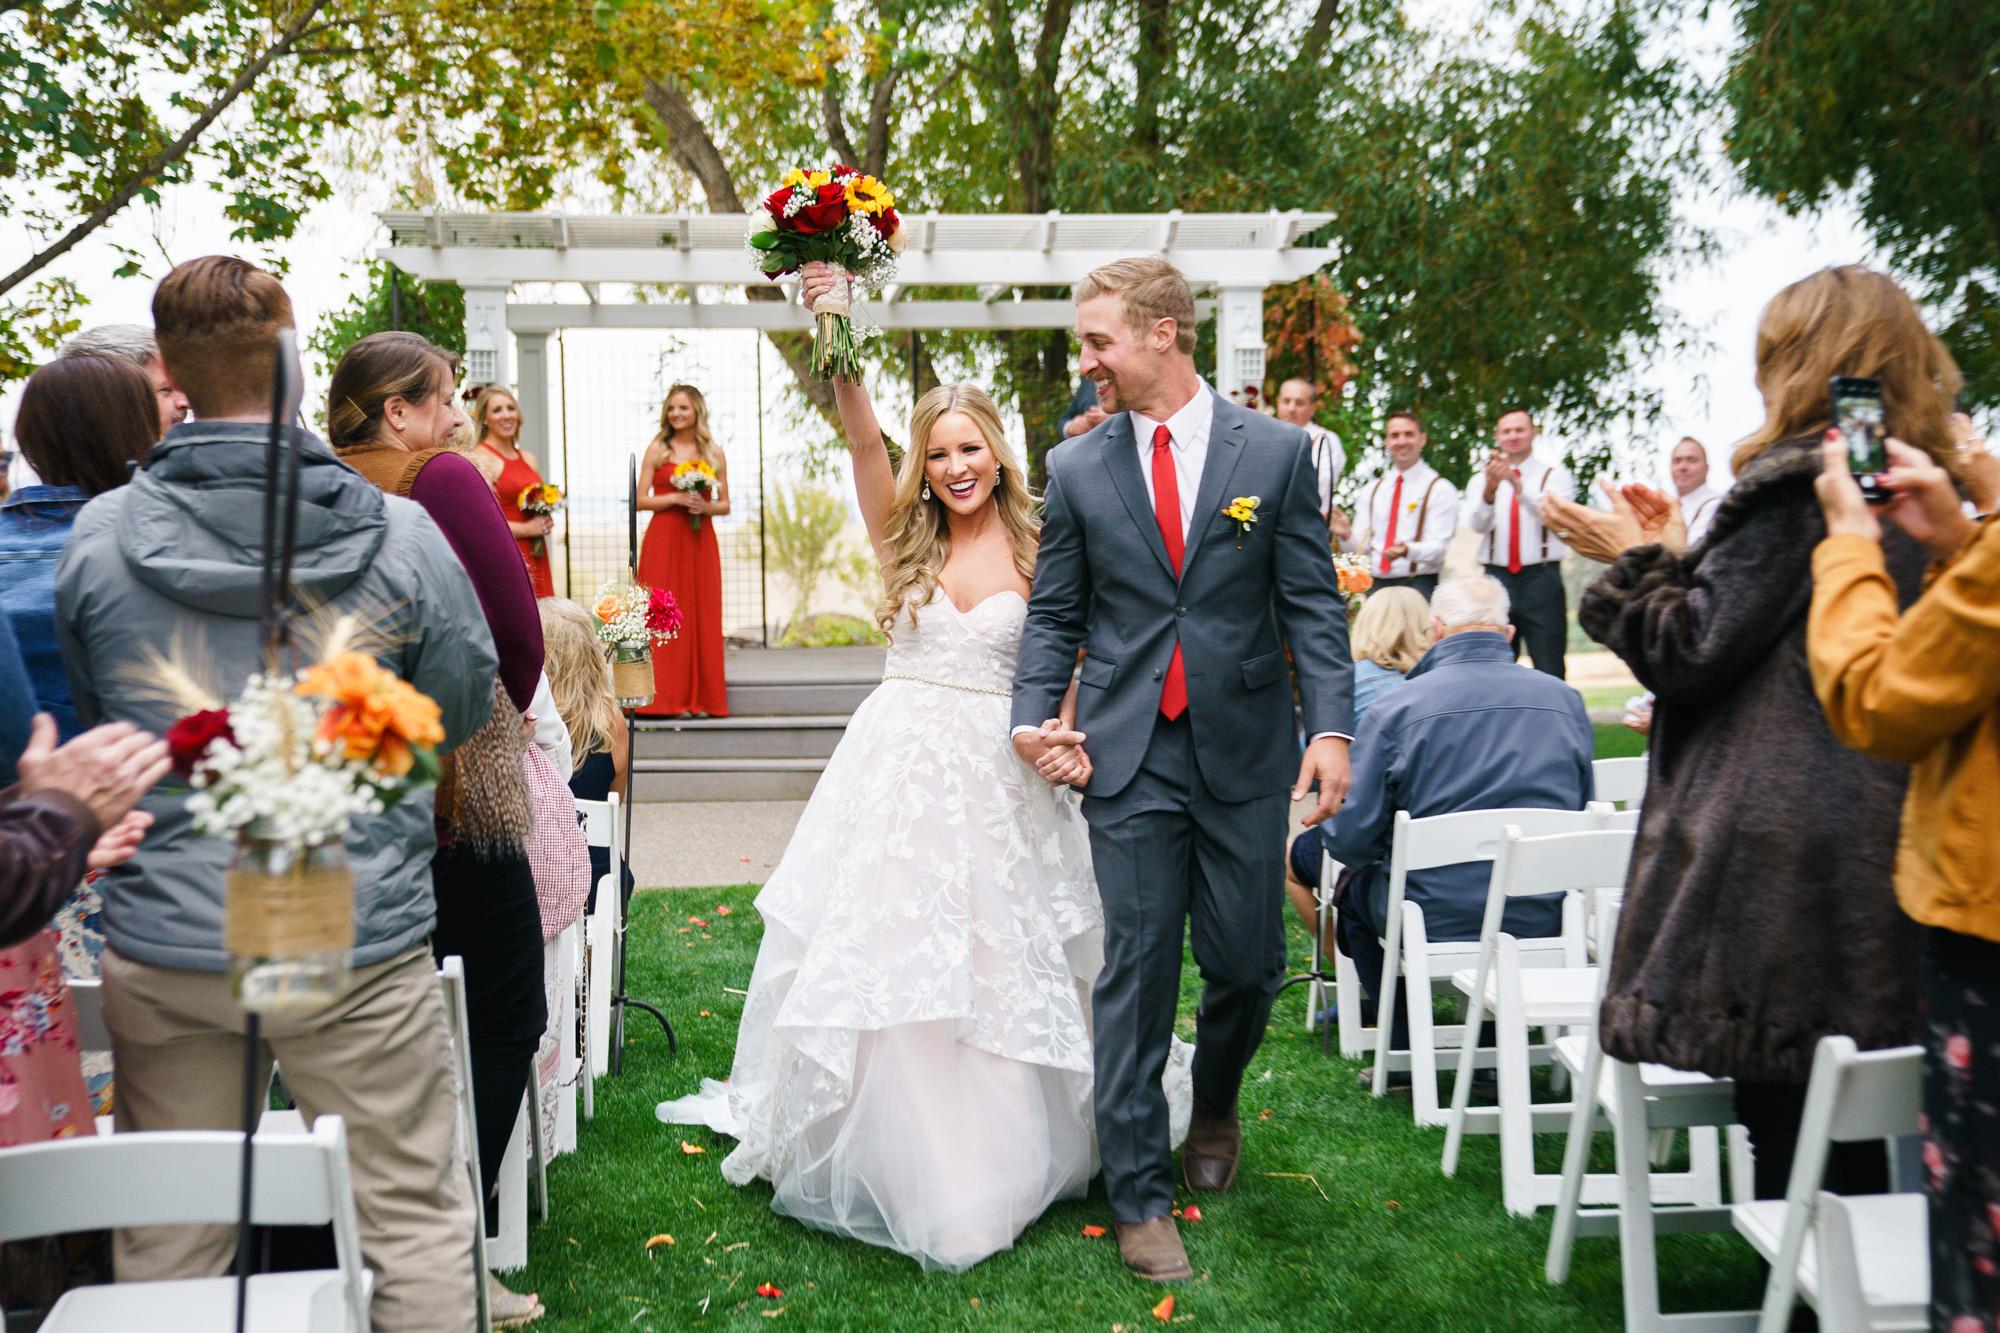 Real Spokane Bride Wedding down the aisle image